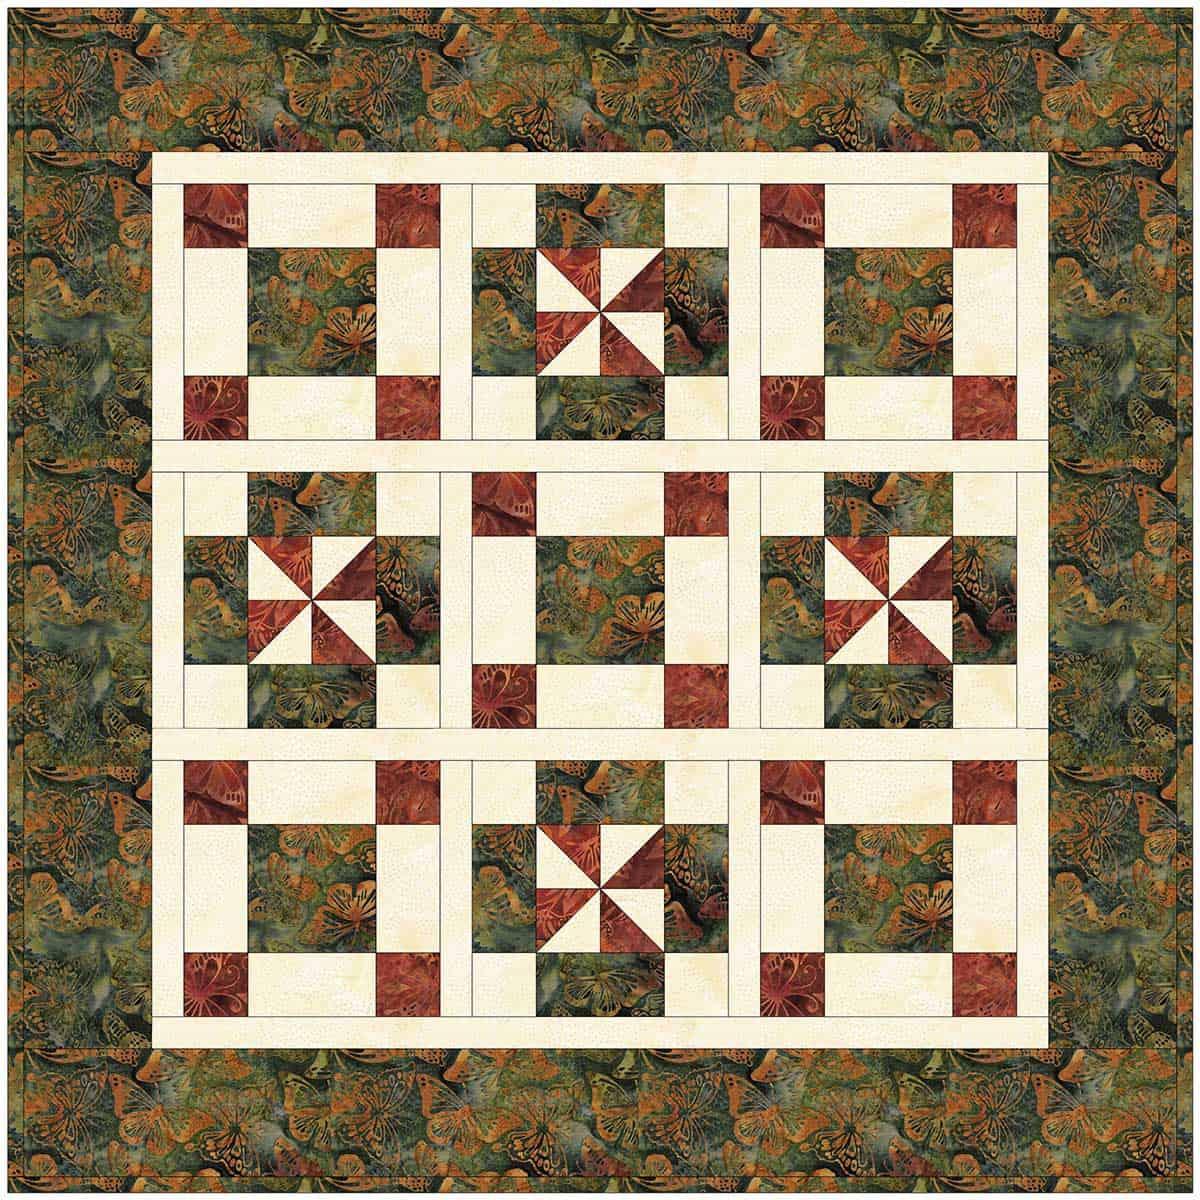 add sashing between the quilt blocks